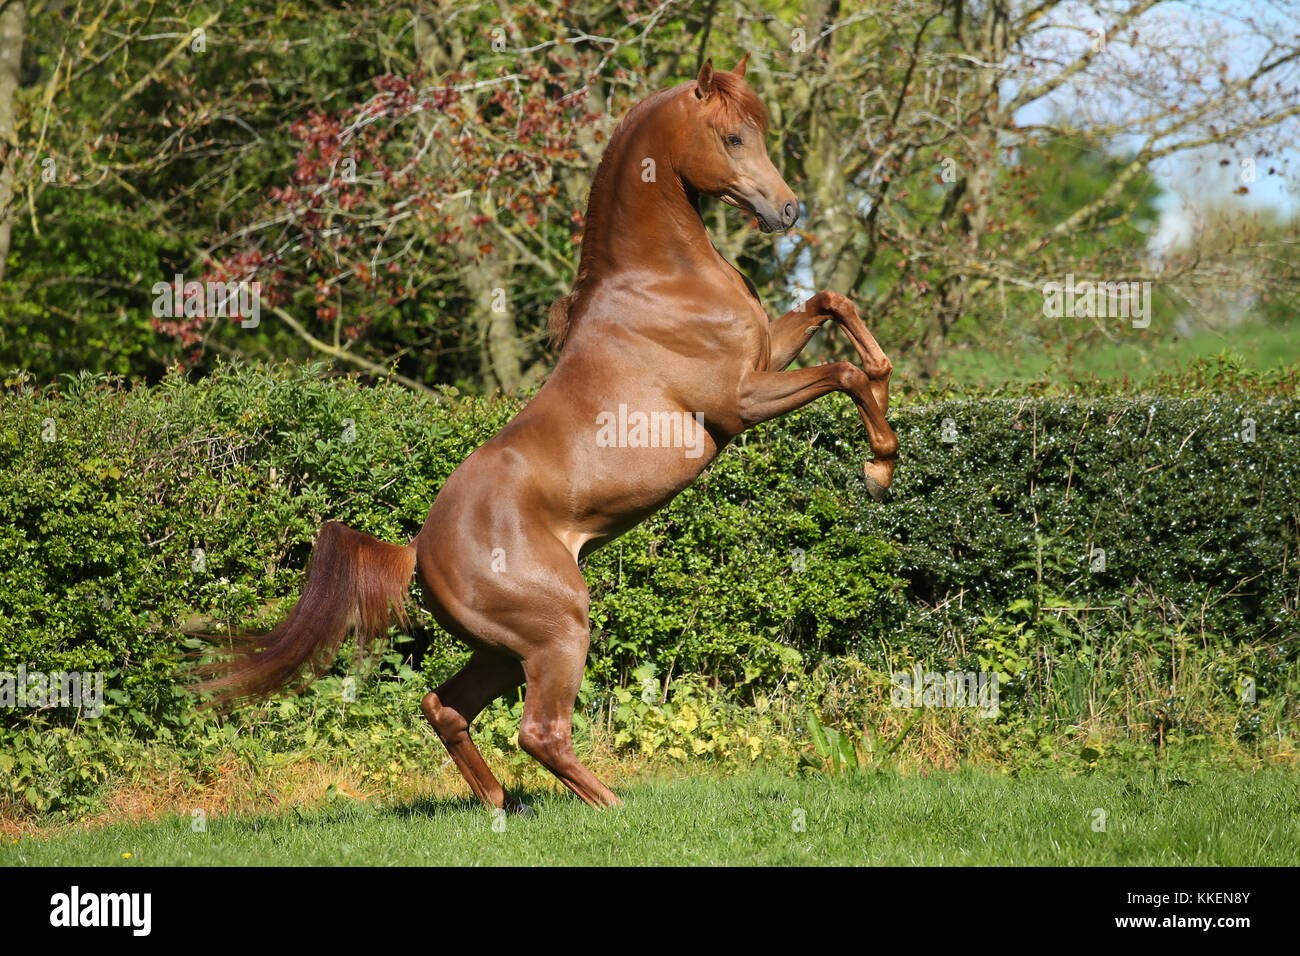 Chestnut Arab Stallion Rearing - Stock Image